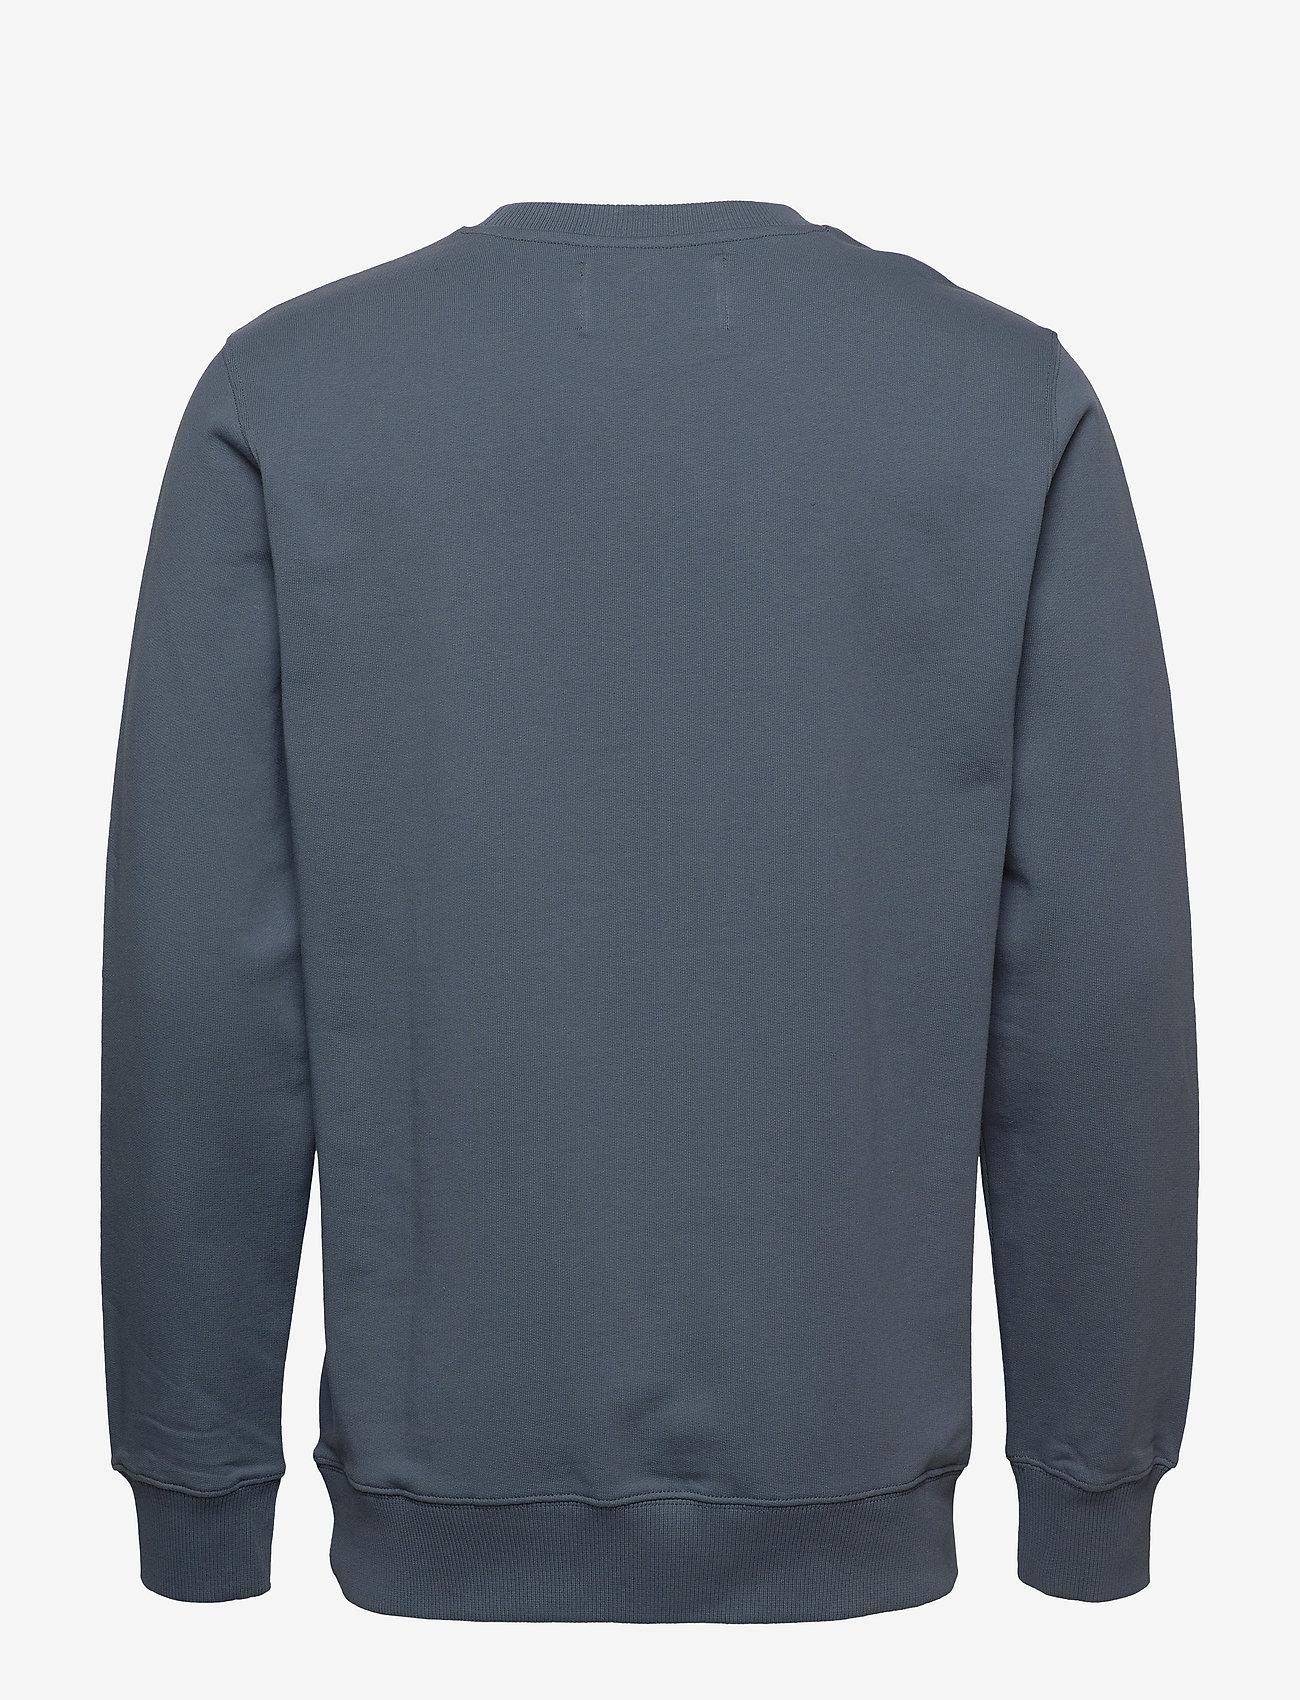 Calvin Klein Jeans - INSTITUTIONAL LOGO SWEATSHIRT - svetarit - orion blue